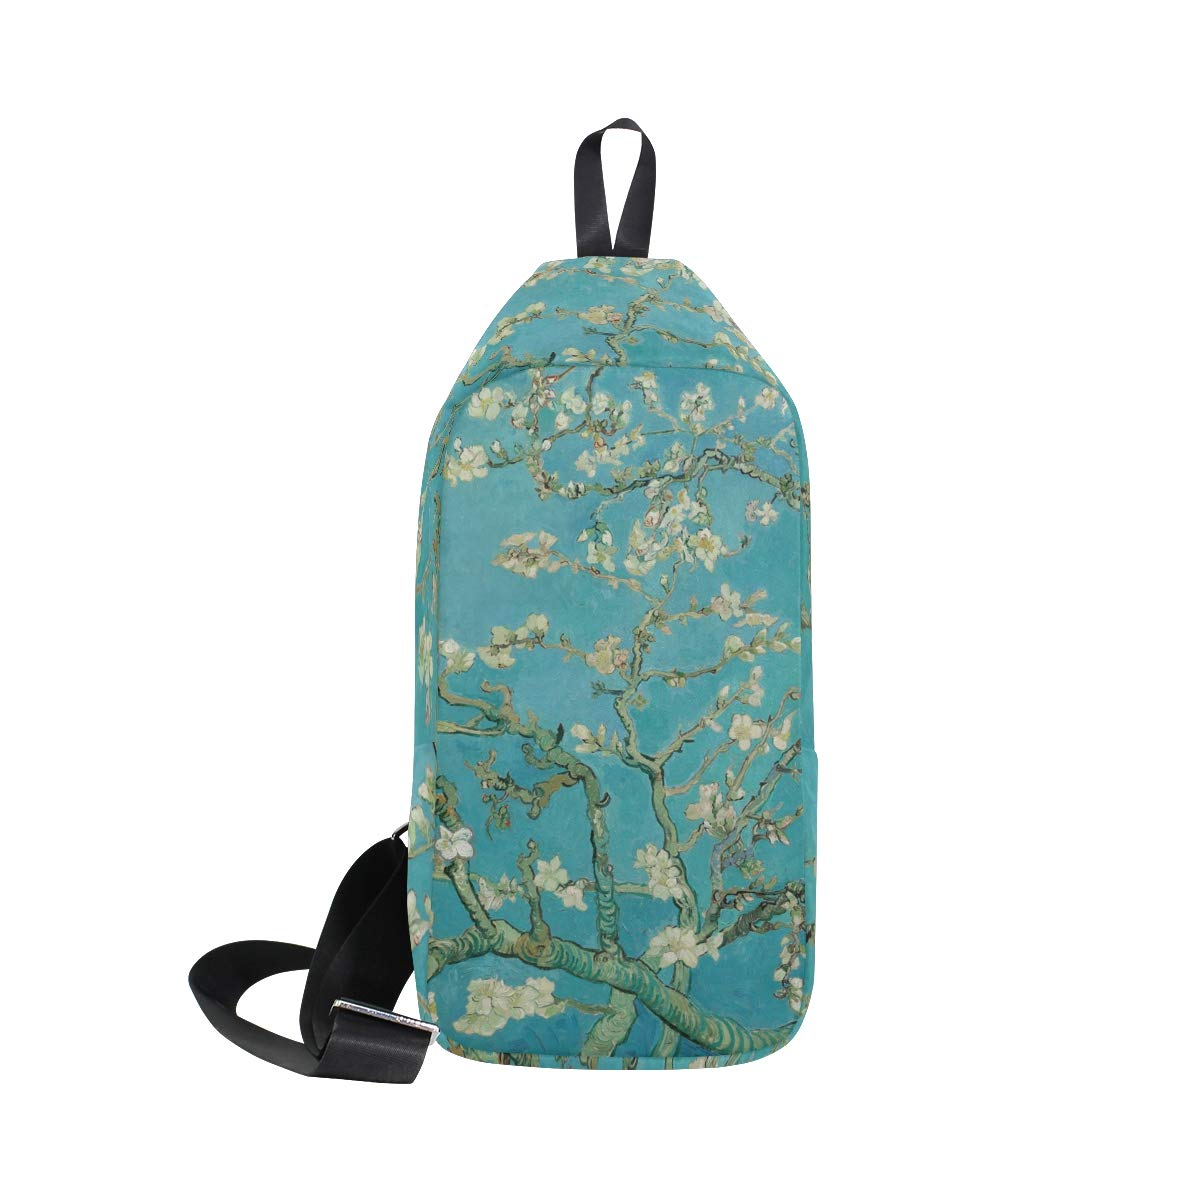 AHOMY Van Gogh Branches Of Almond Tree In Blossom Messenger Bag Small Travel School Sling Bag Crossbody Bag